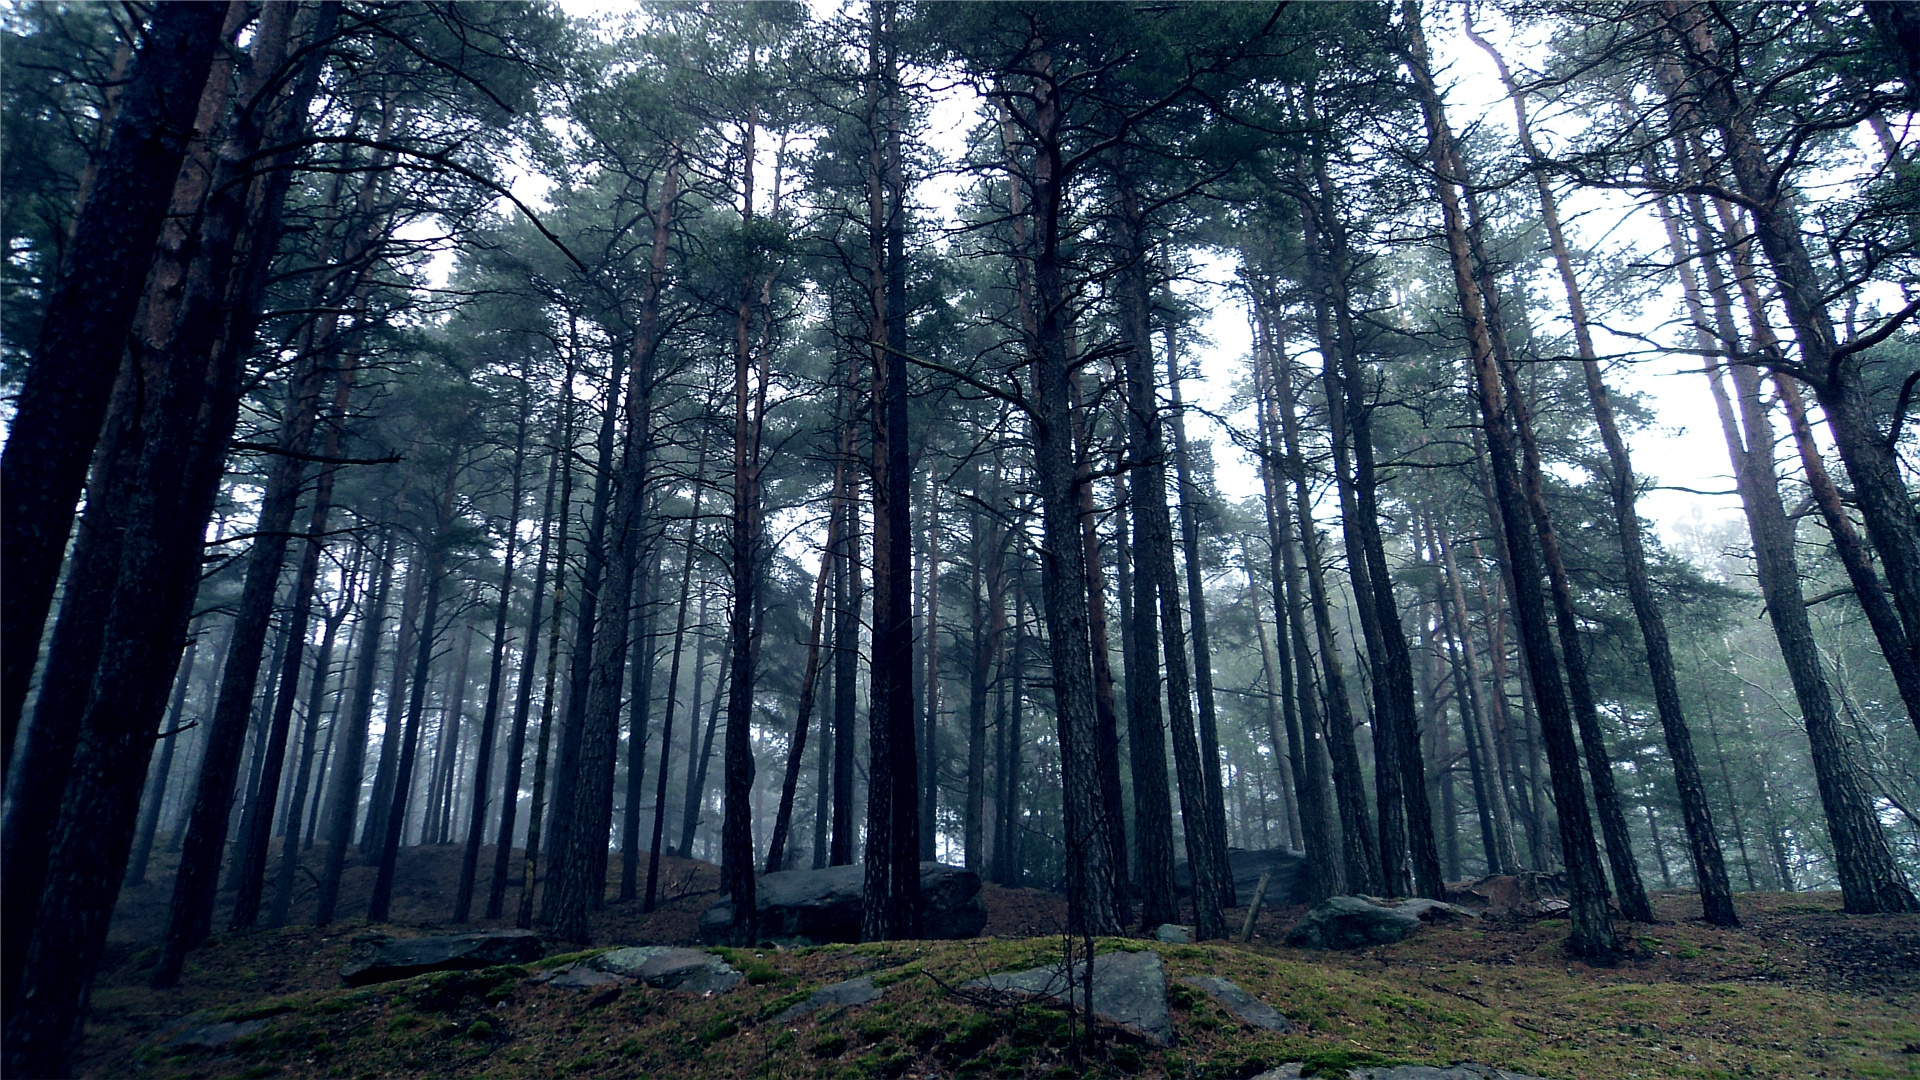 Fall Woodsy Pc Wallpaper Wallpaper Wood Trees Kroner Stones Gloomy Earth